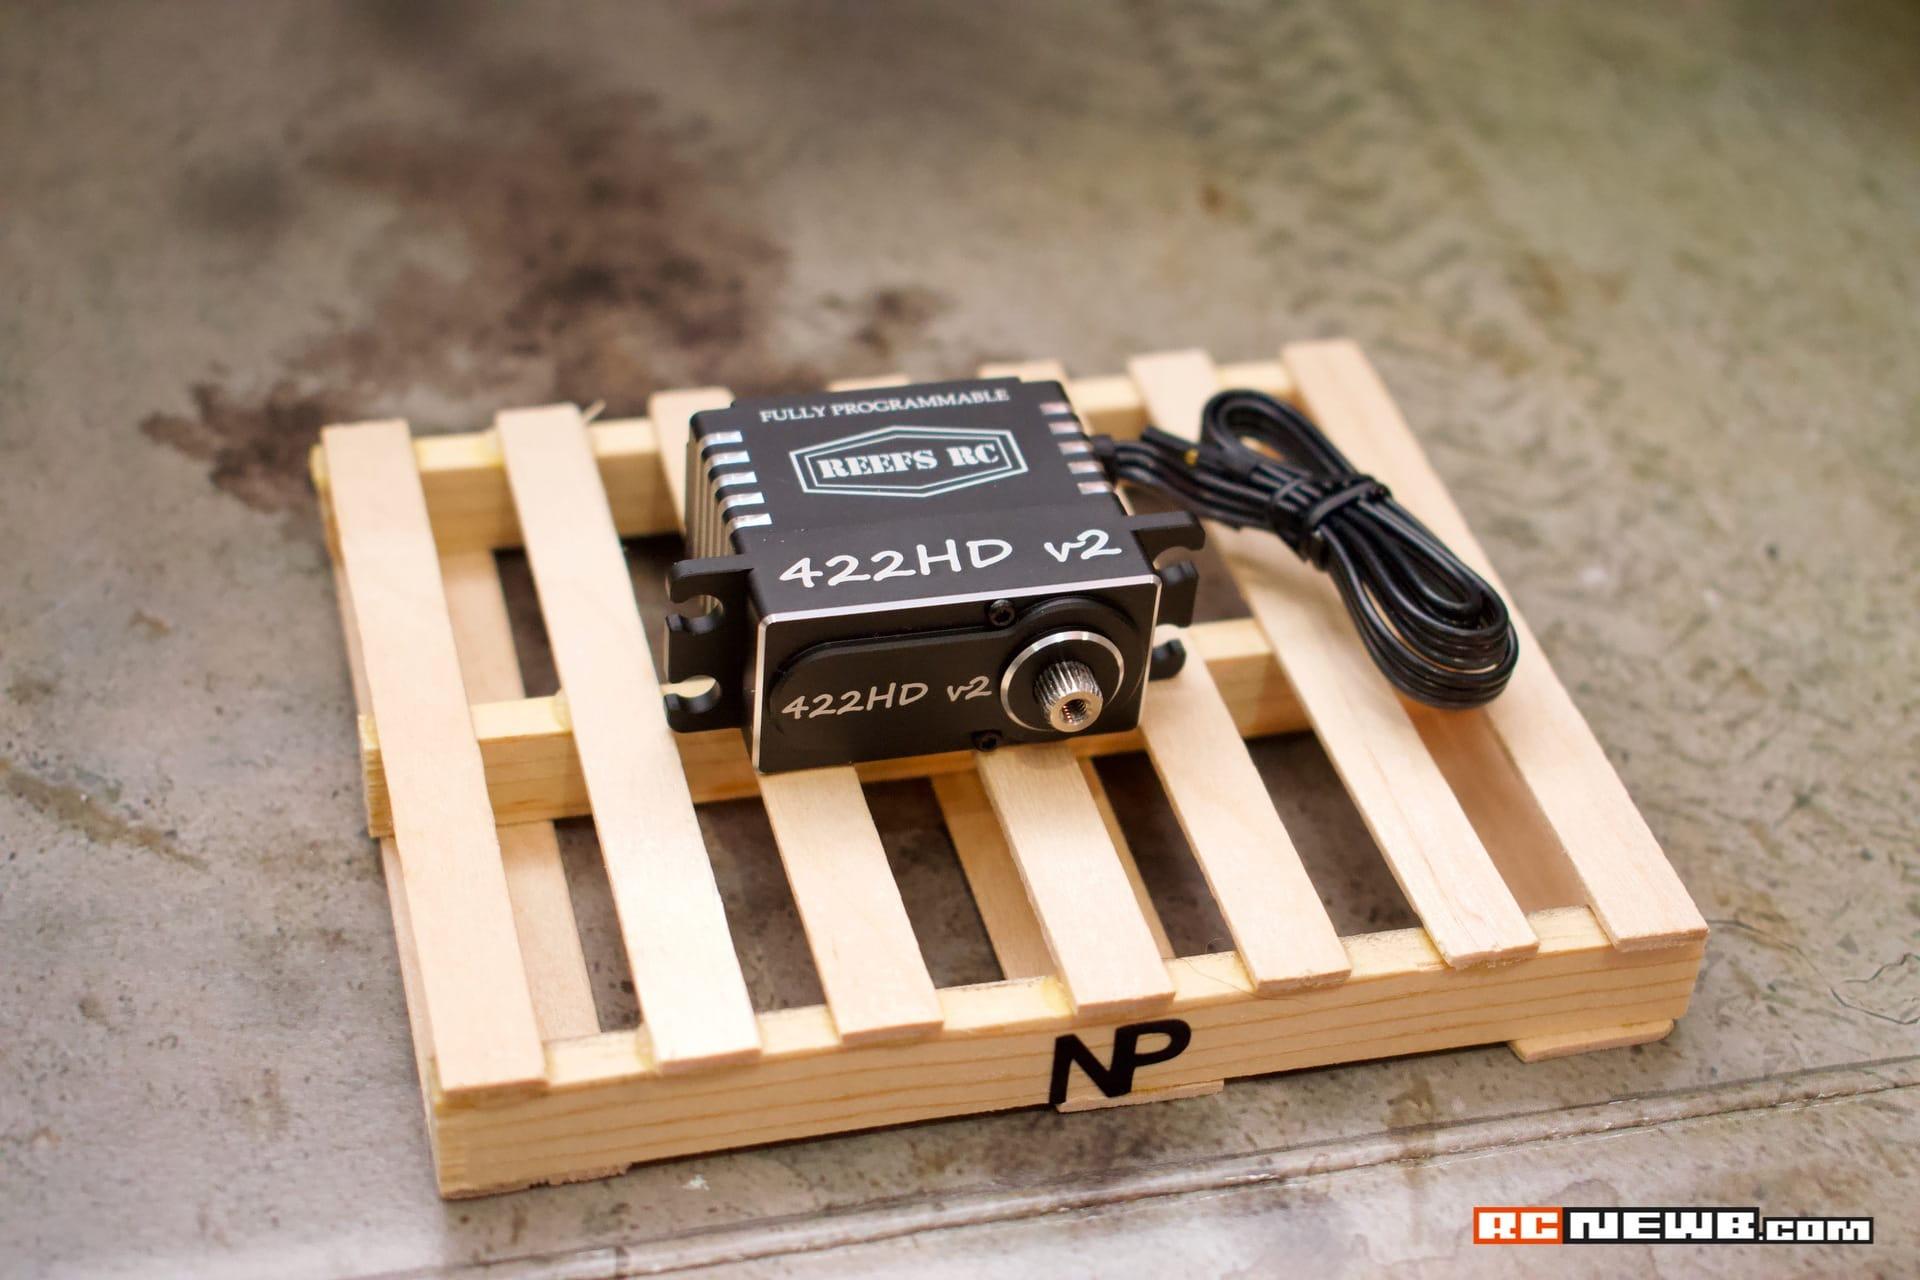 Review: REEF's RC 422HD V2 Steering Servo